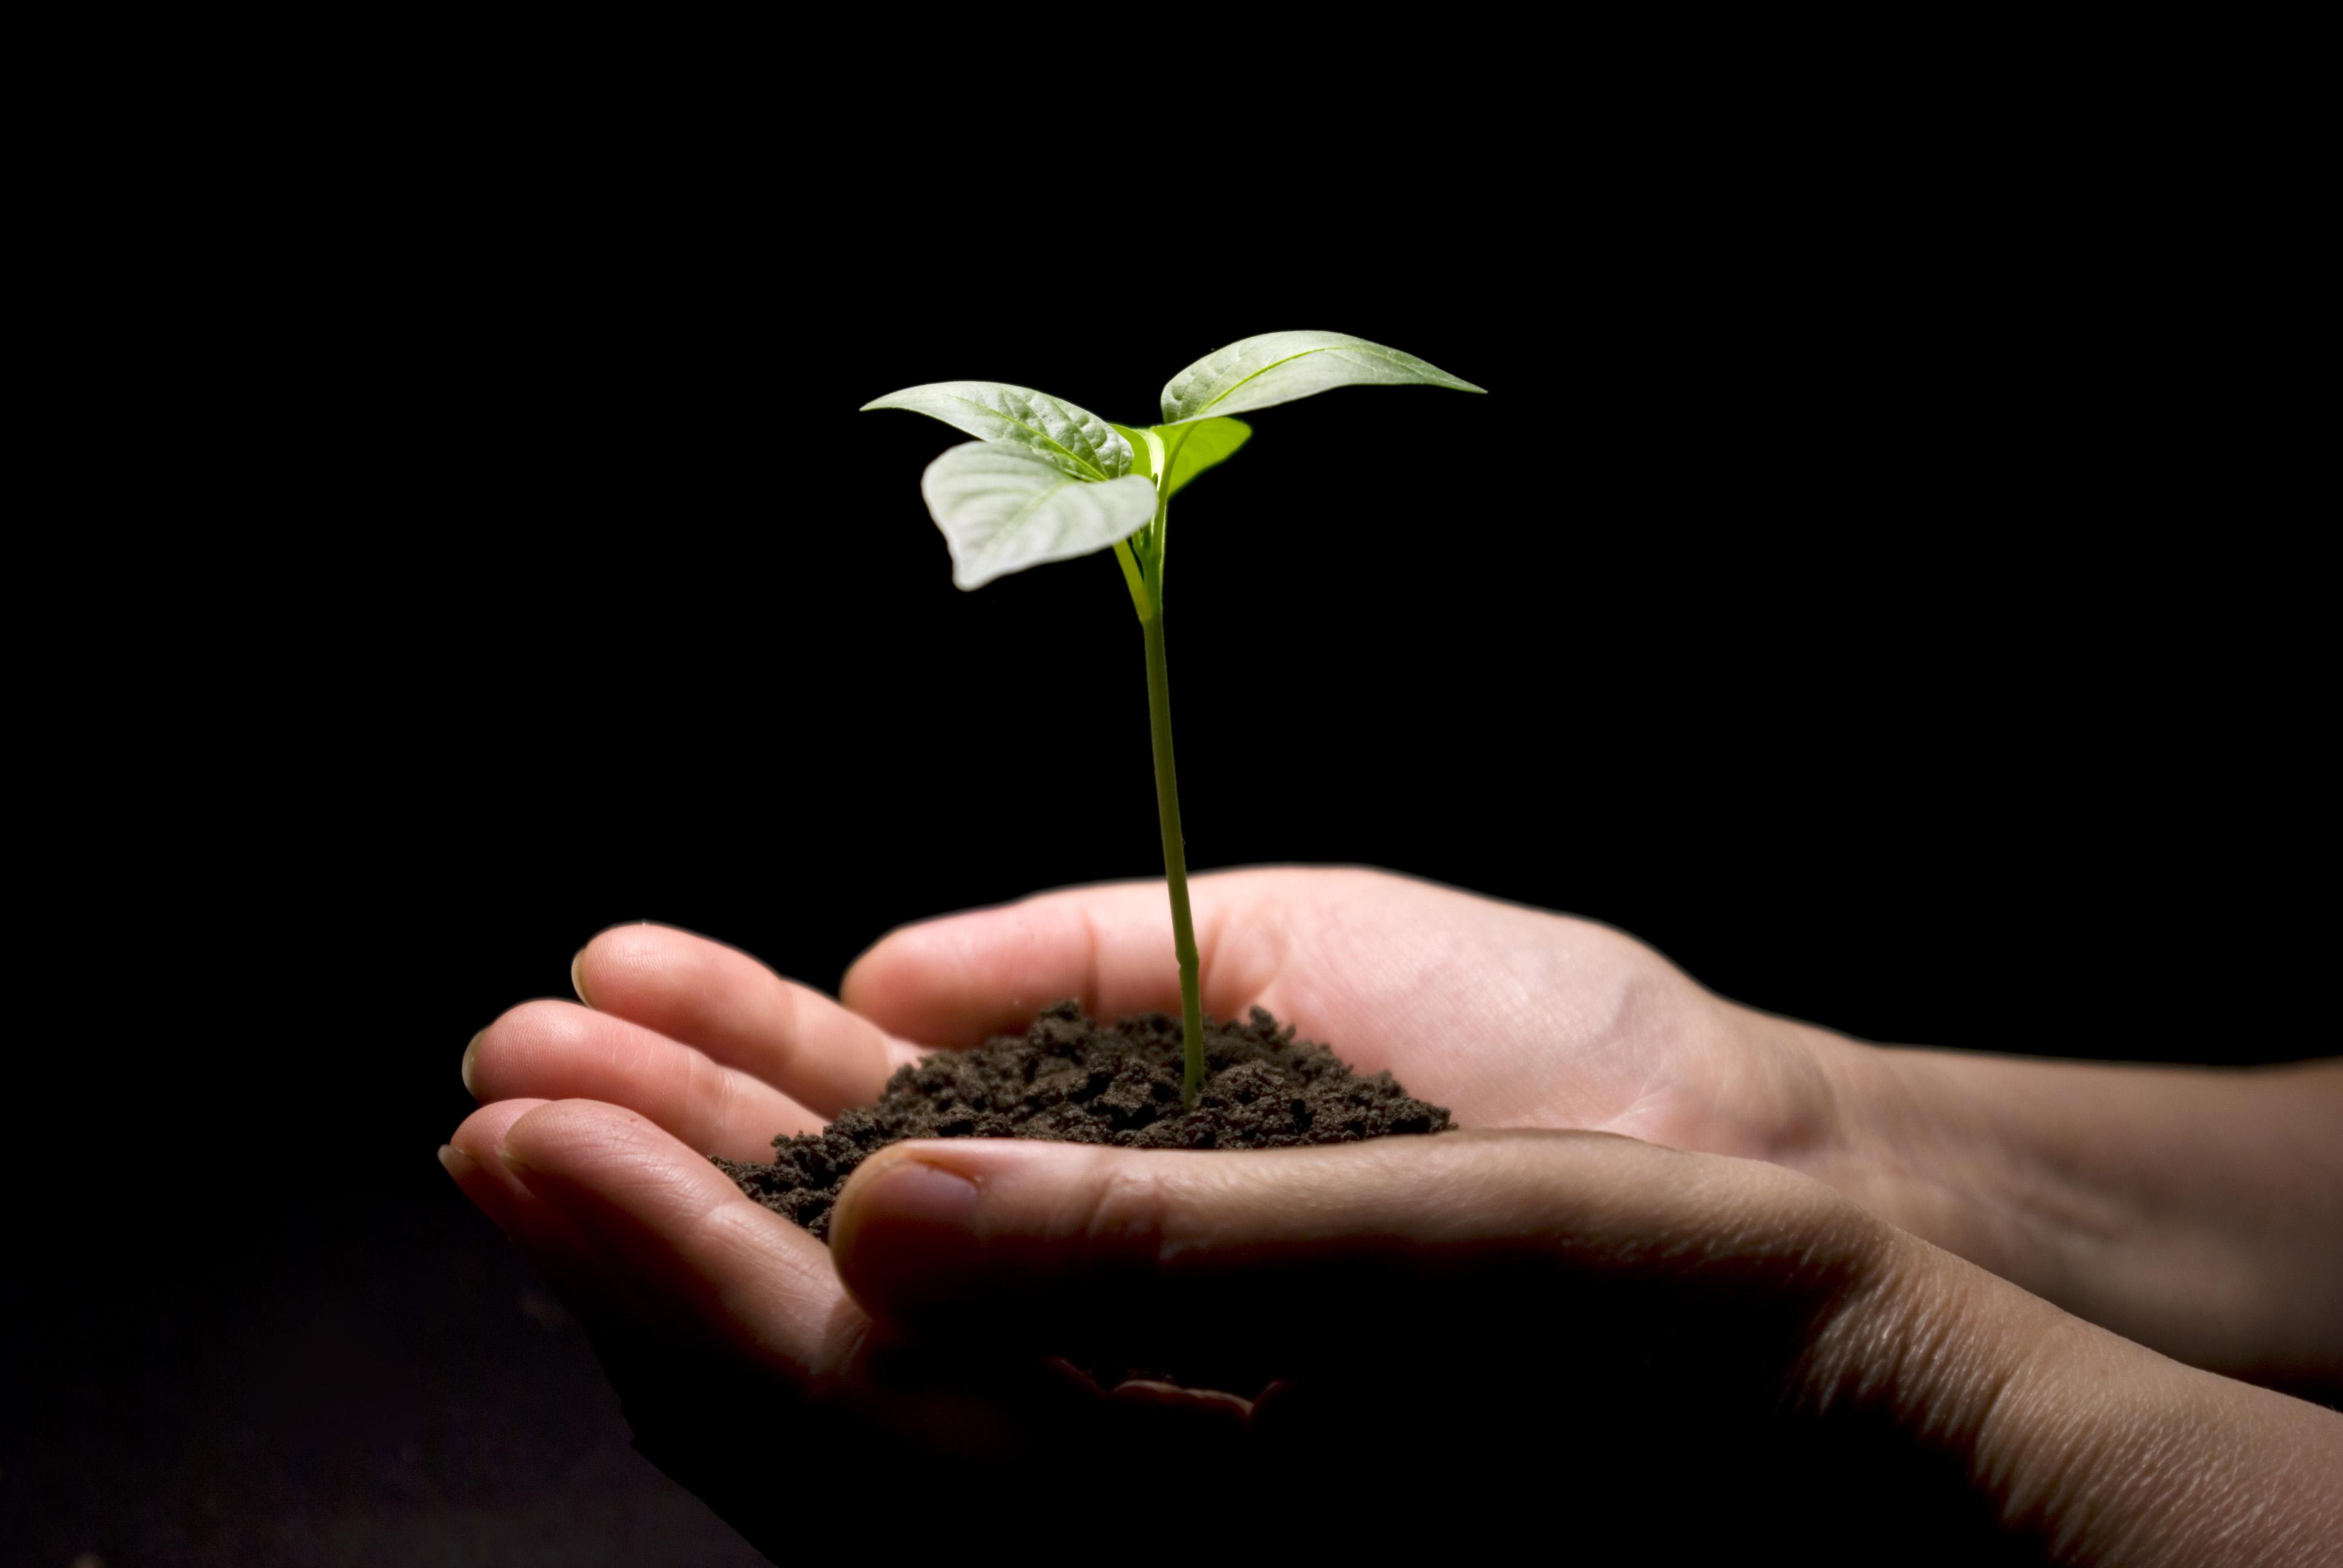 hands___plant.jpg